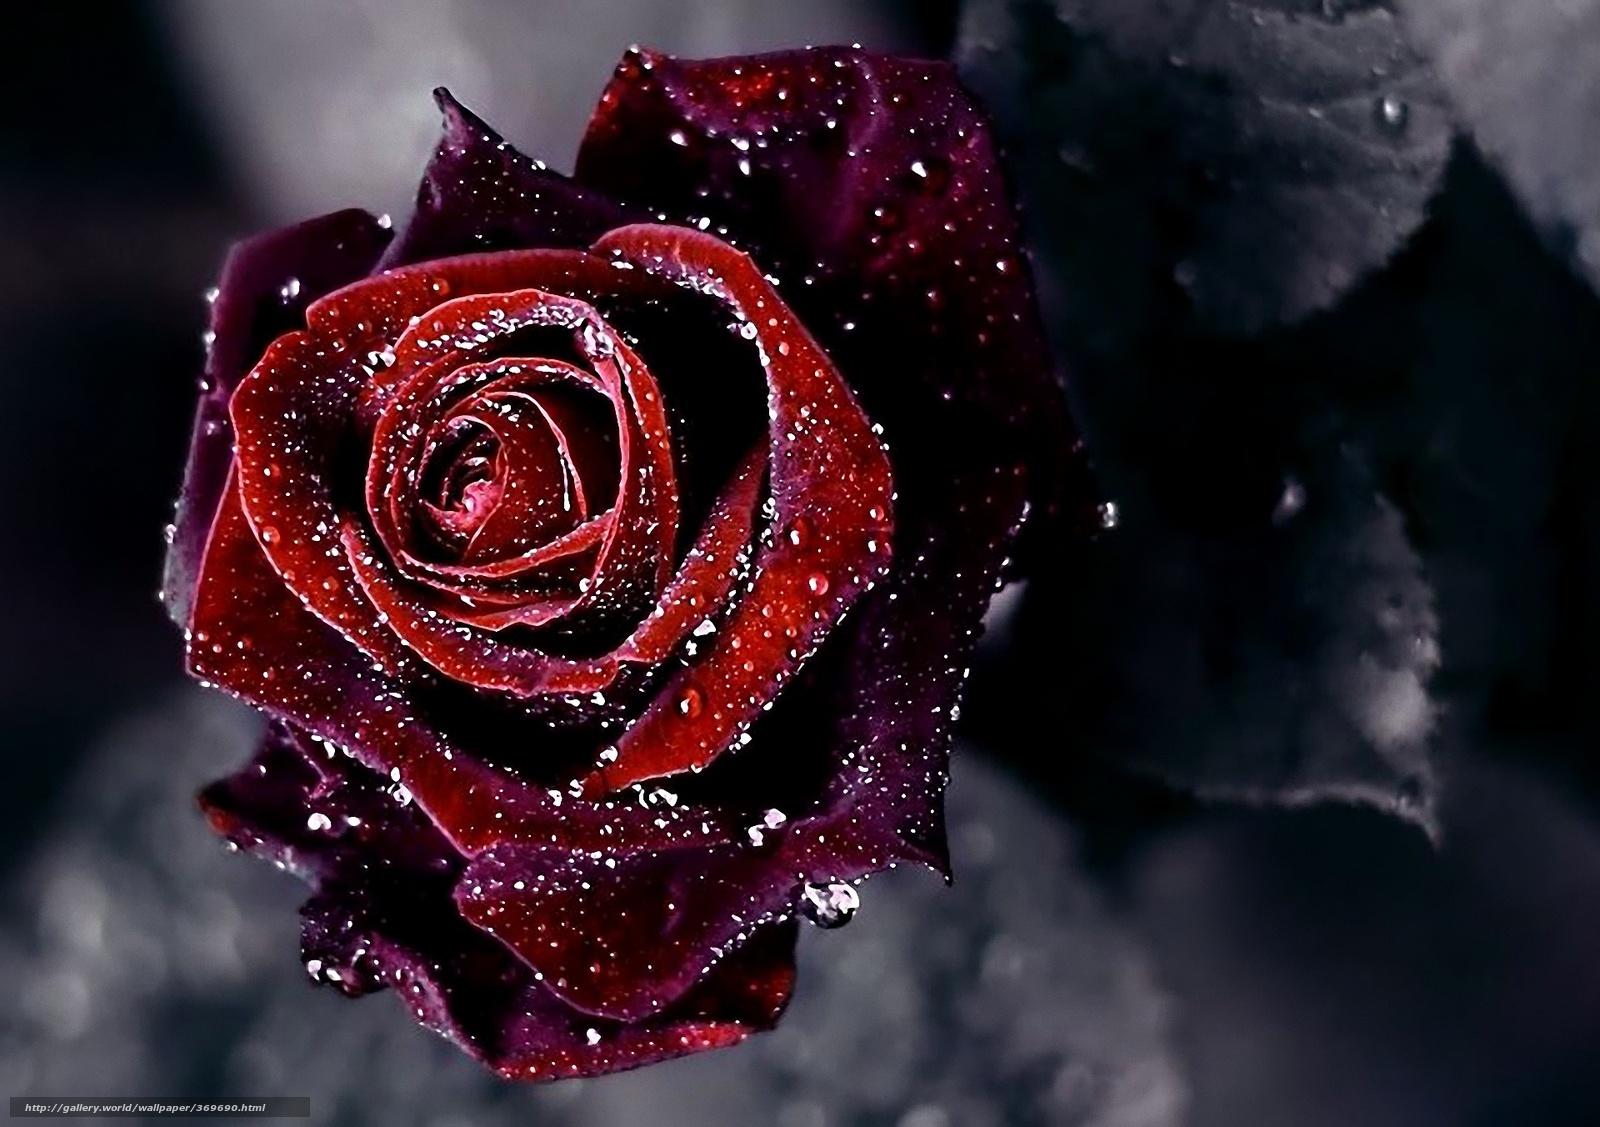 tlcharger fond d'ecran fleur, rose, gouttes, rose fonds d'ecran